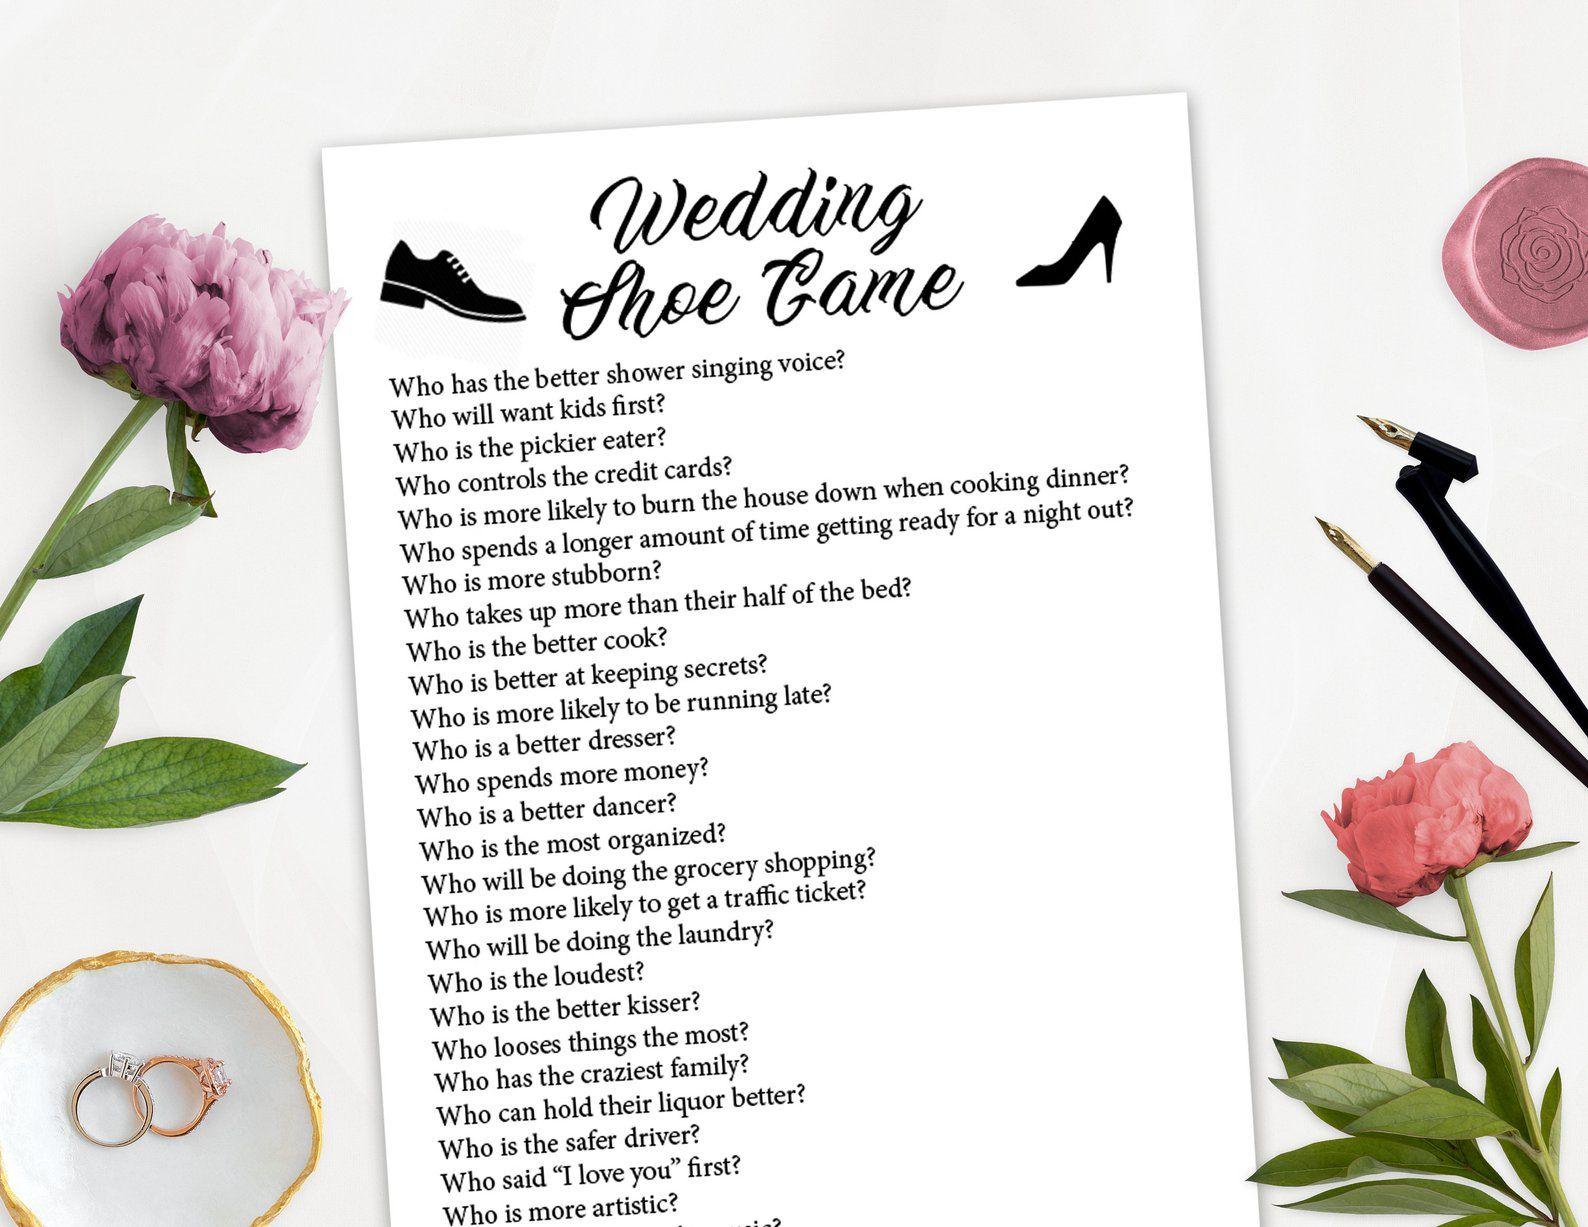 Wedding Shoe Printable Game, Wedding Shoe Game Questions